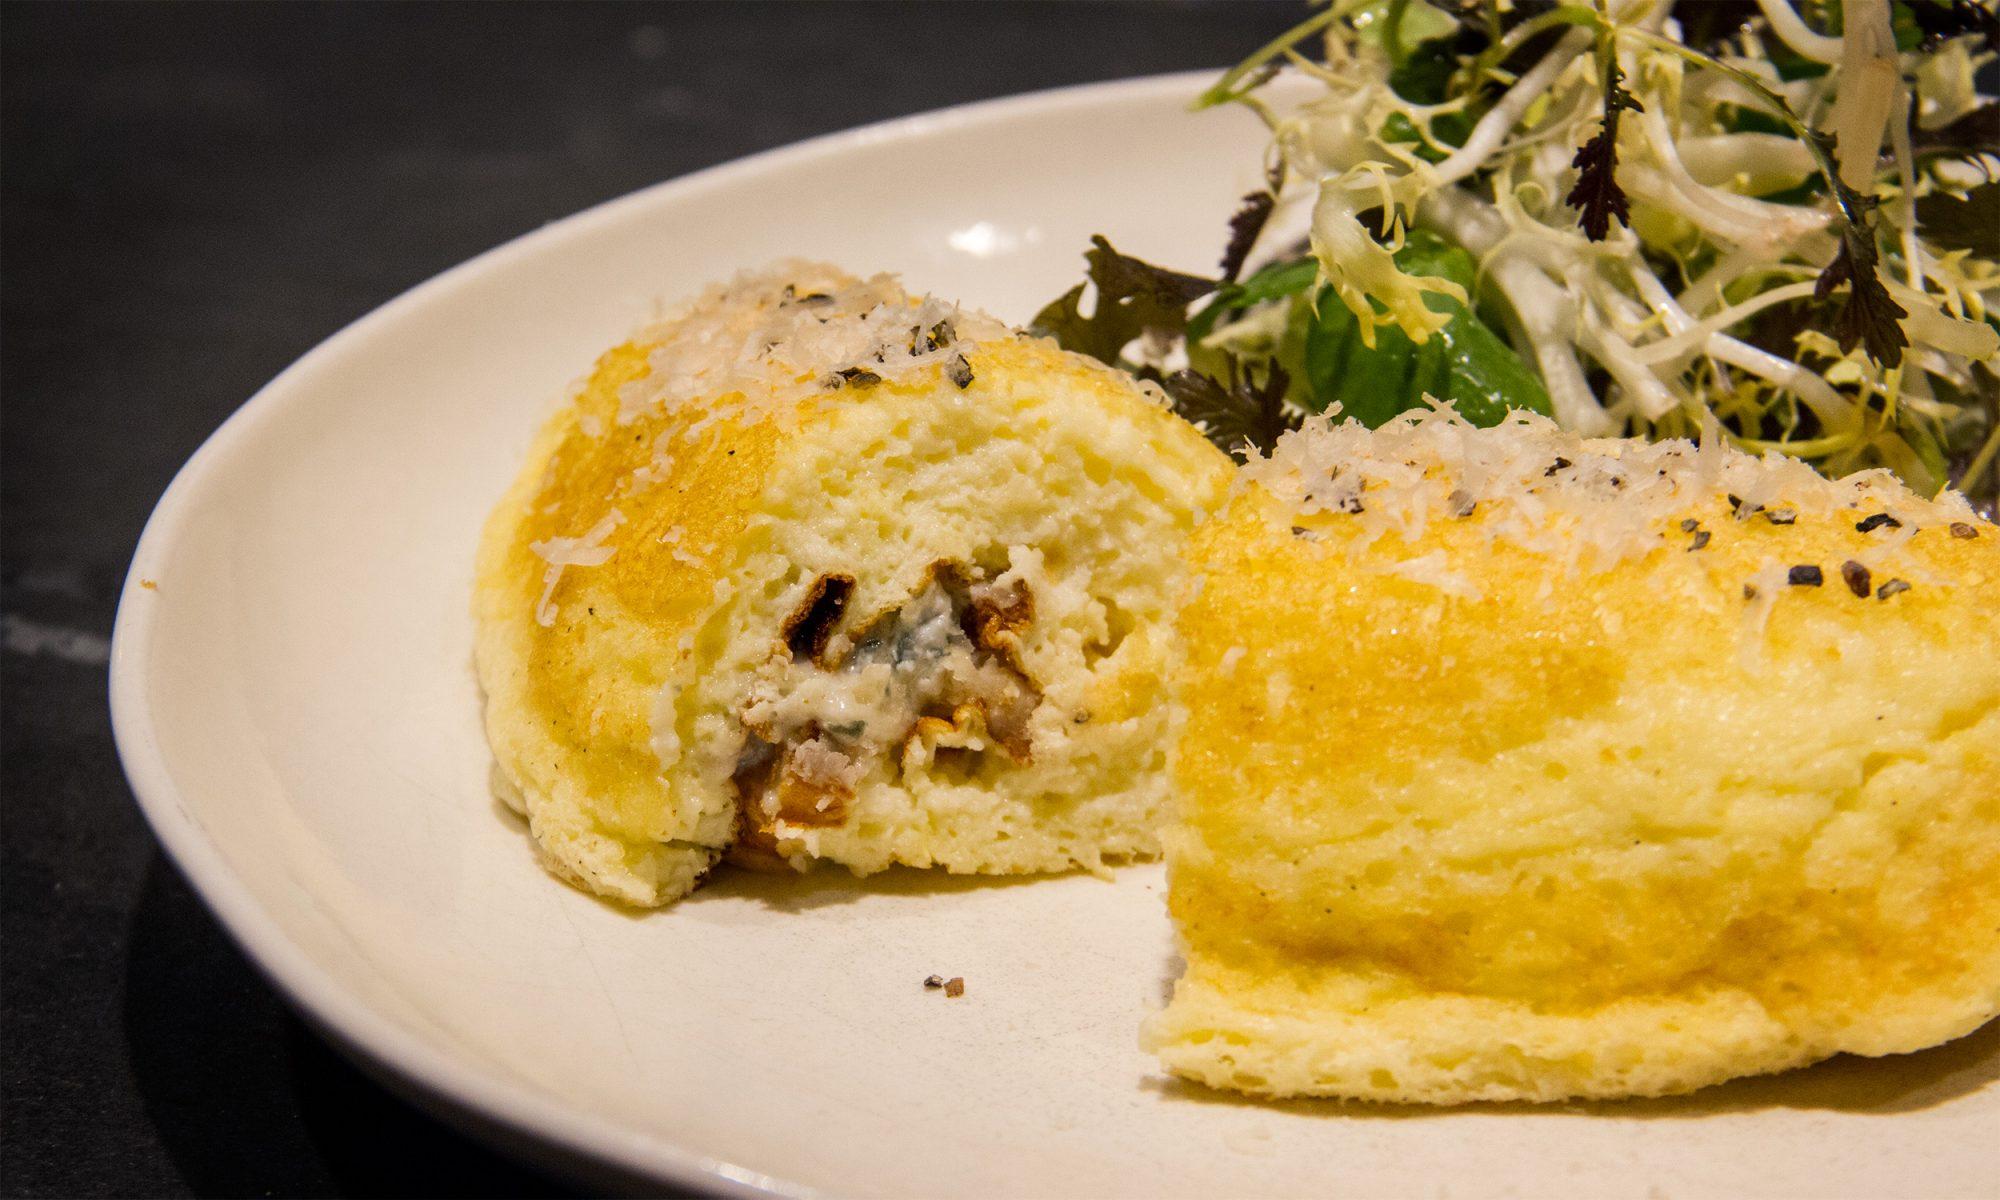 EC: This Omelet Tastes Just Like Cacio e Pepe—Minus the Pasta